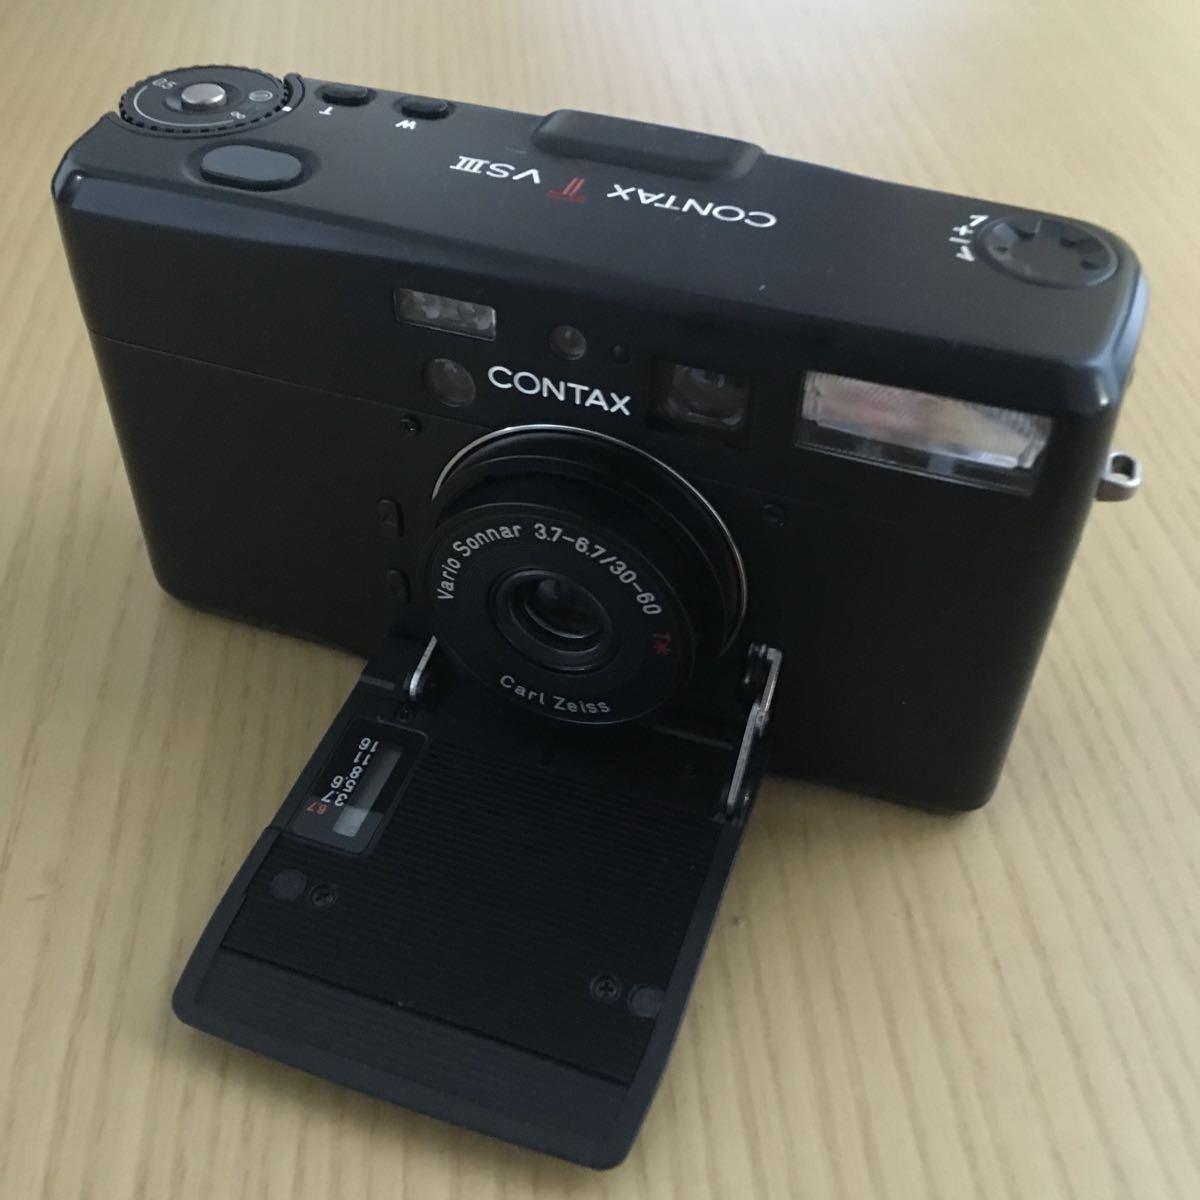 Contax TVS Ⅲ ブラック(Carl Zeiss Vario Sonnar 30-60mm f3.7-6.7) T vs 3 動作写りOK 概ねキレイ ストラップ2種 革ケース 説明書 内外箱_画像3